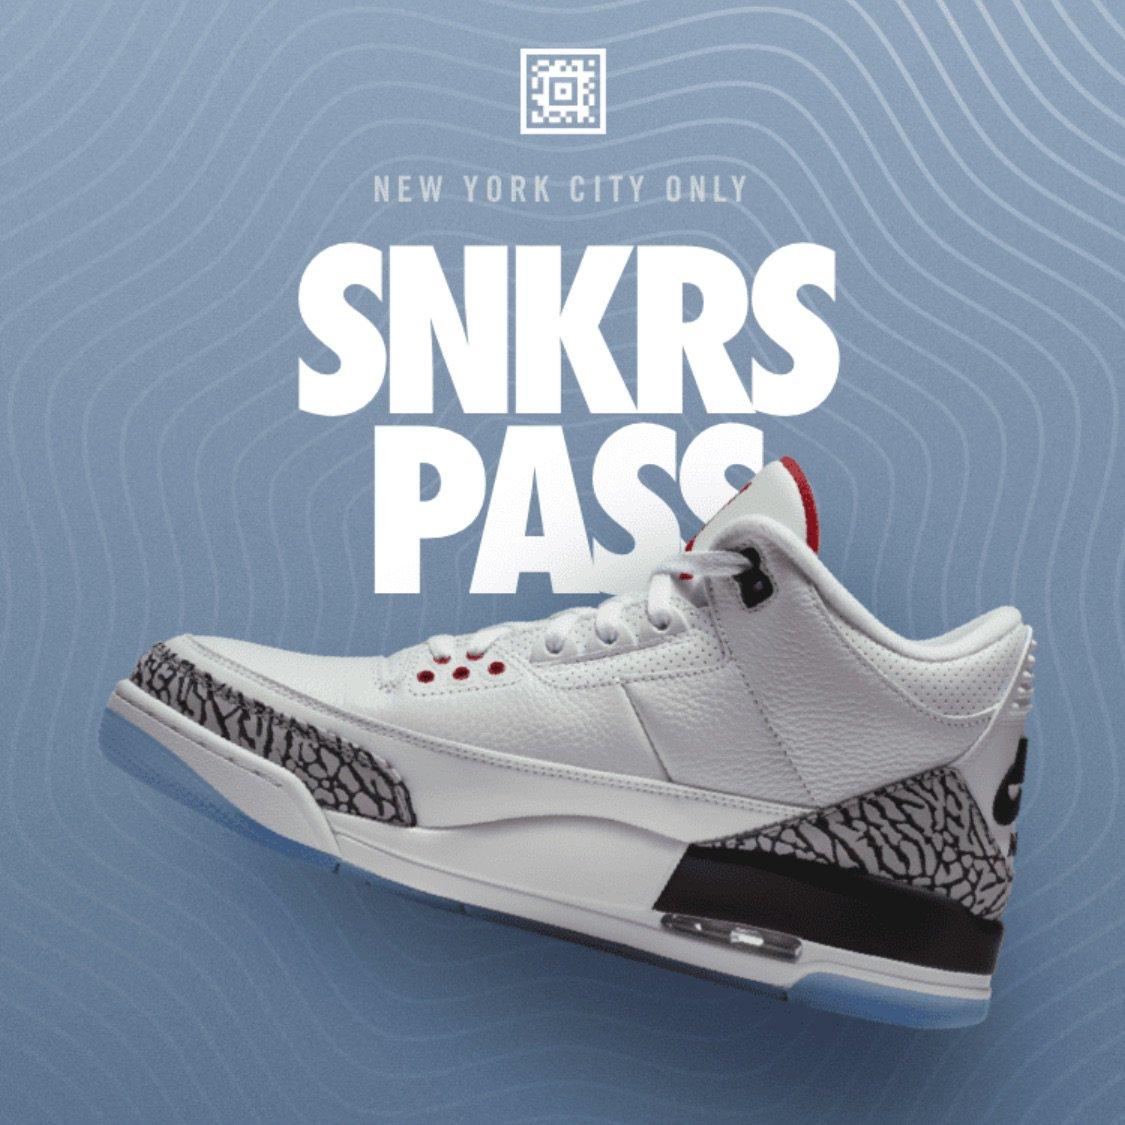 "NYC SNKRS Pass: Jordan 3 Retro NRG ""Free..."